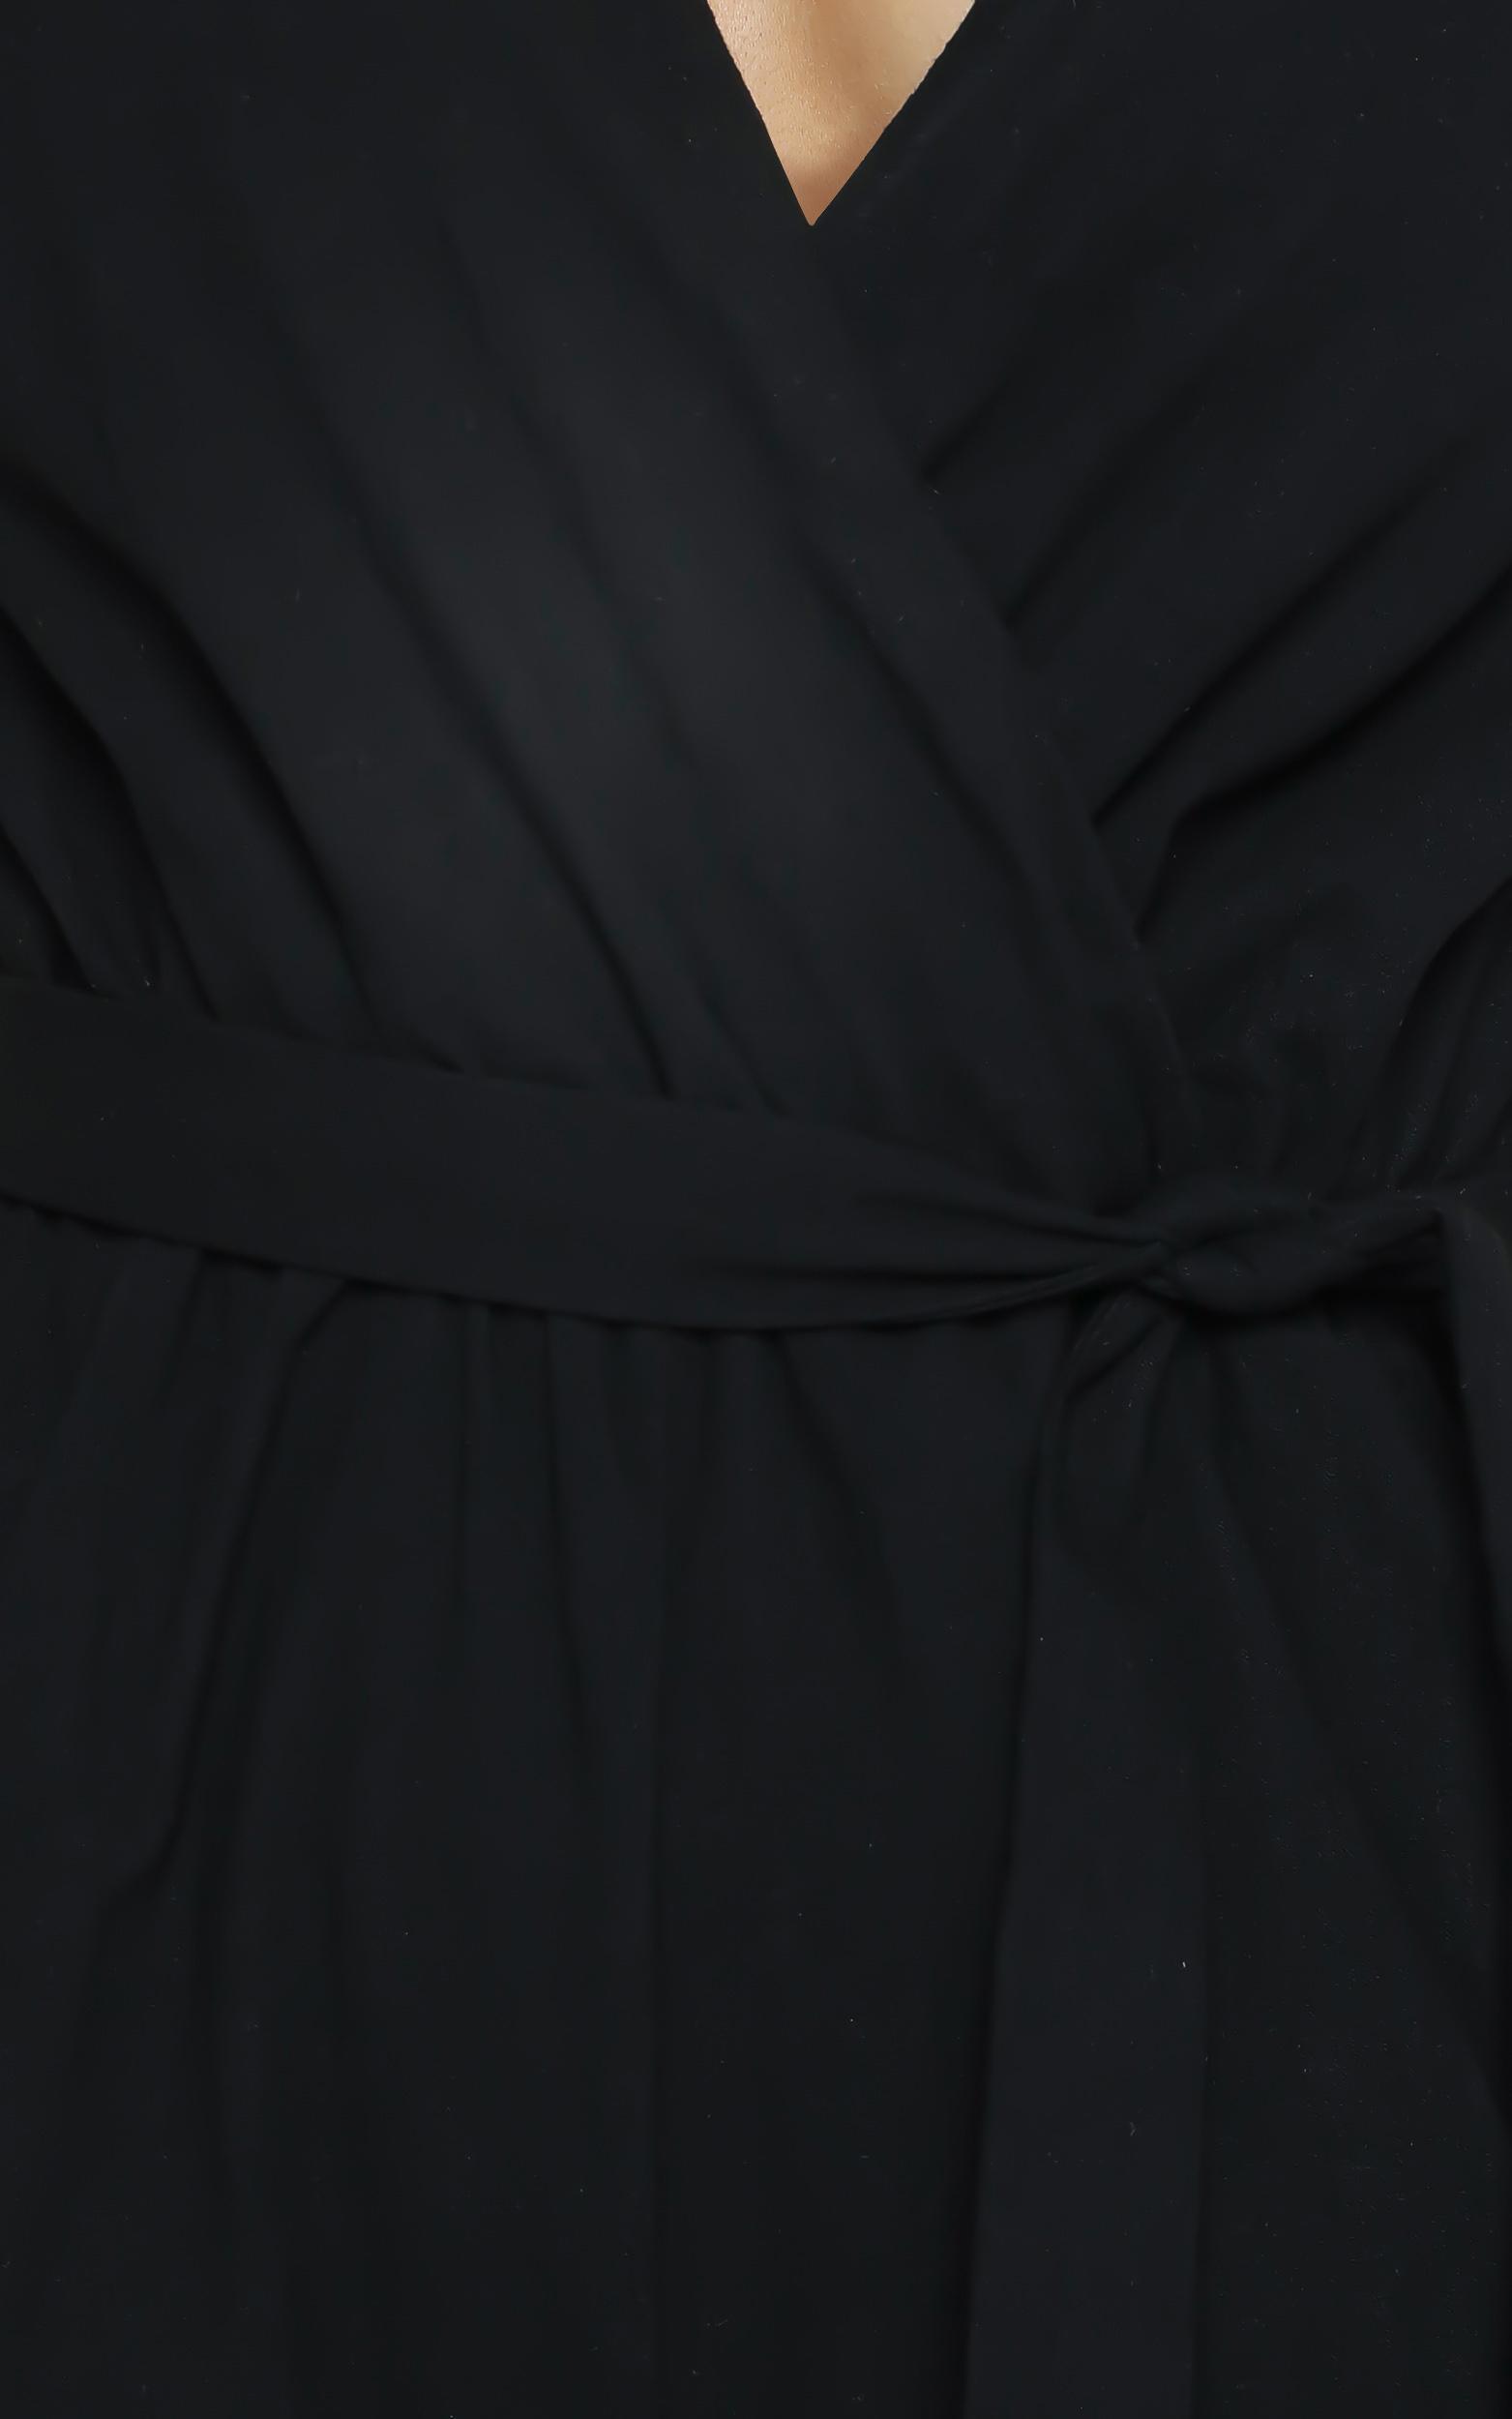 Darlin Playsuit in Black - 6 (XS), Black, hi-res image number null